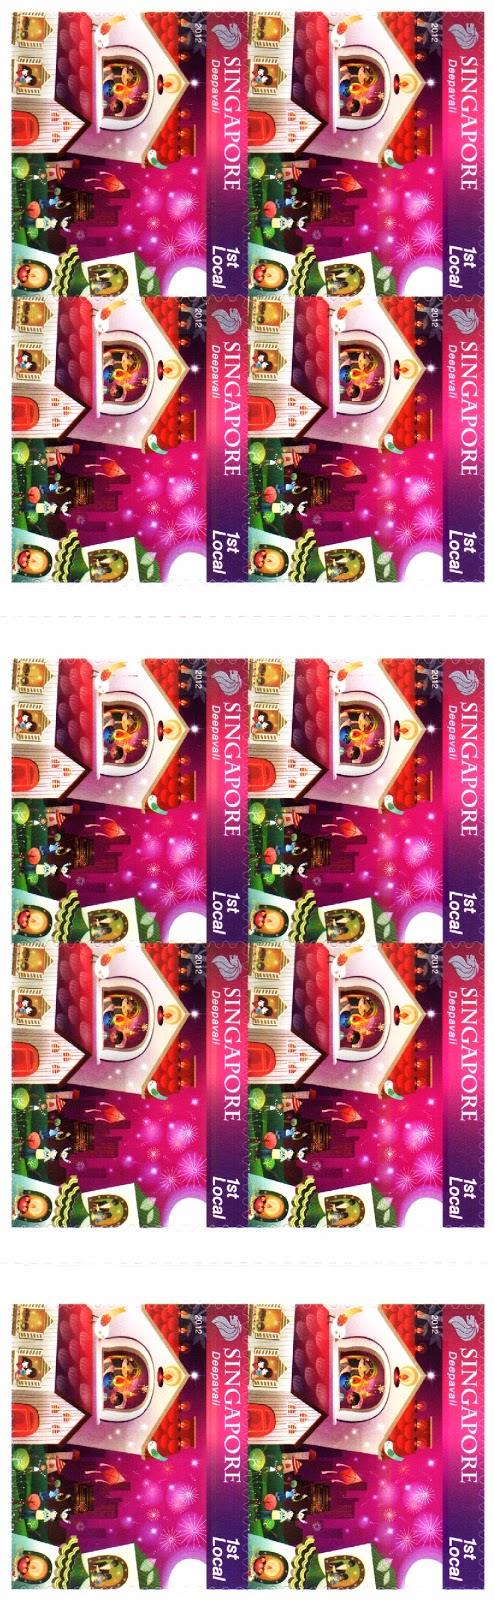 Self-adhesive Stamp Booklet S$2.55 - Deepavali